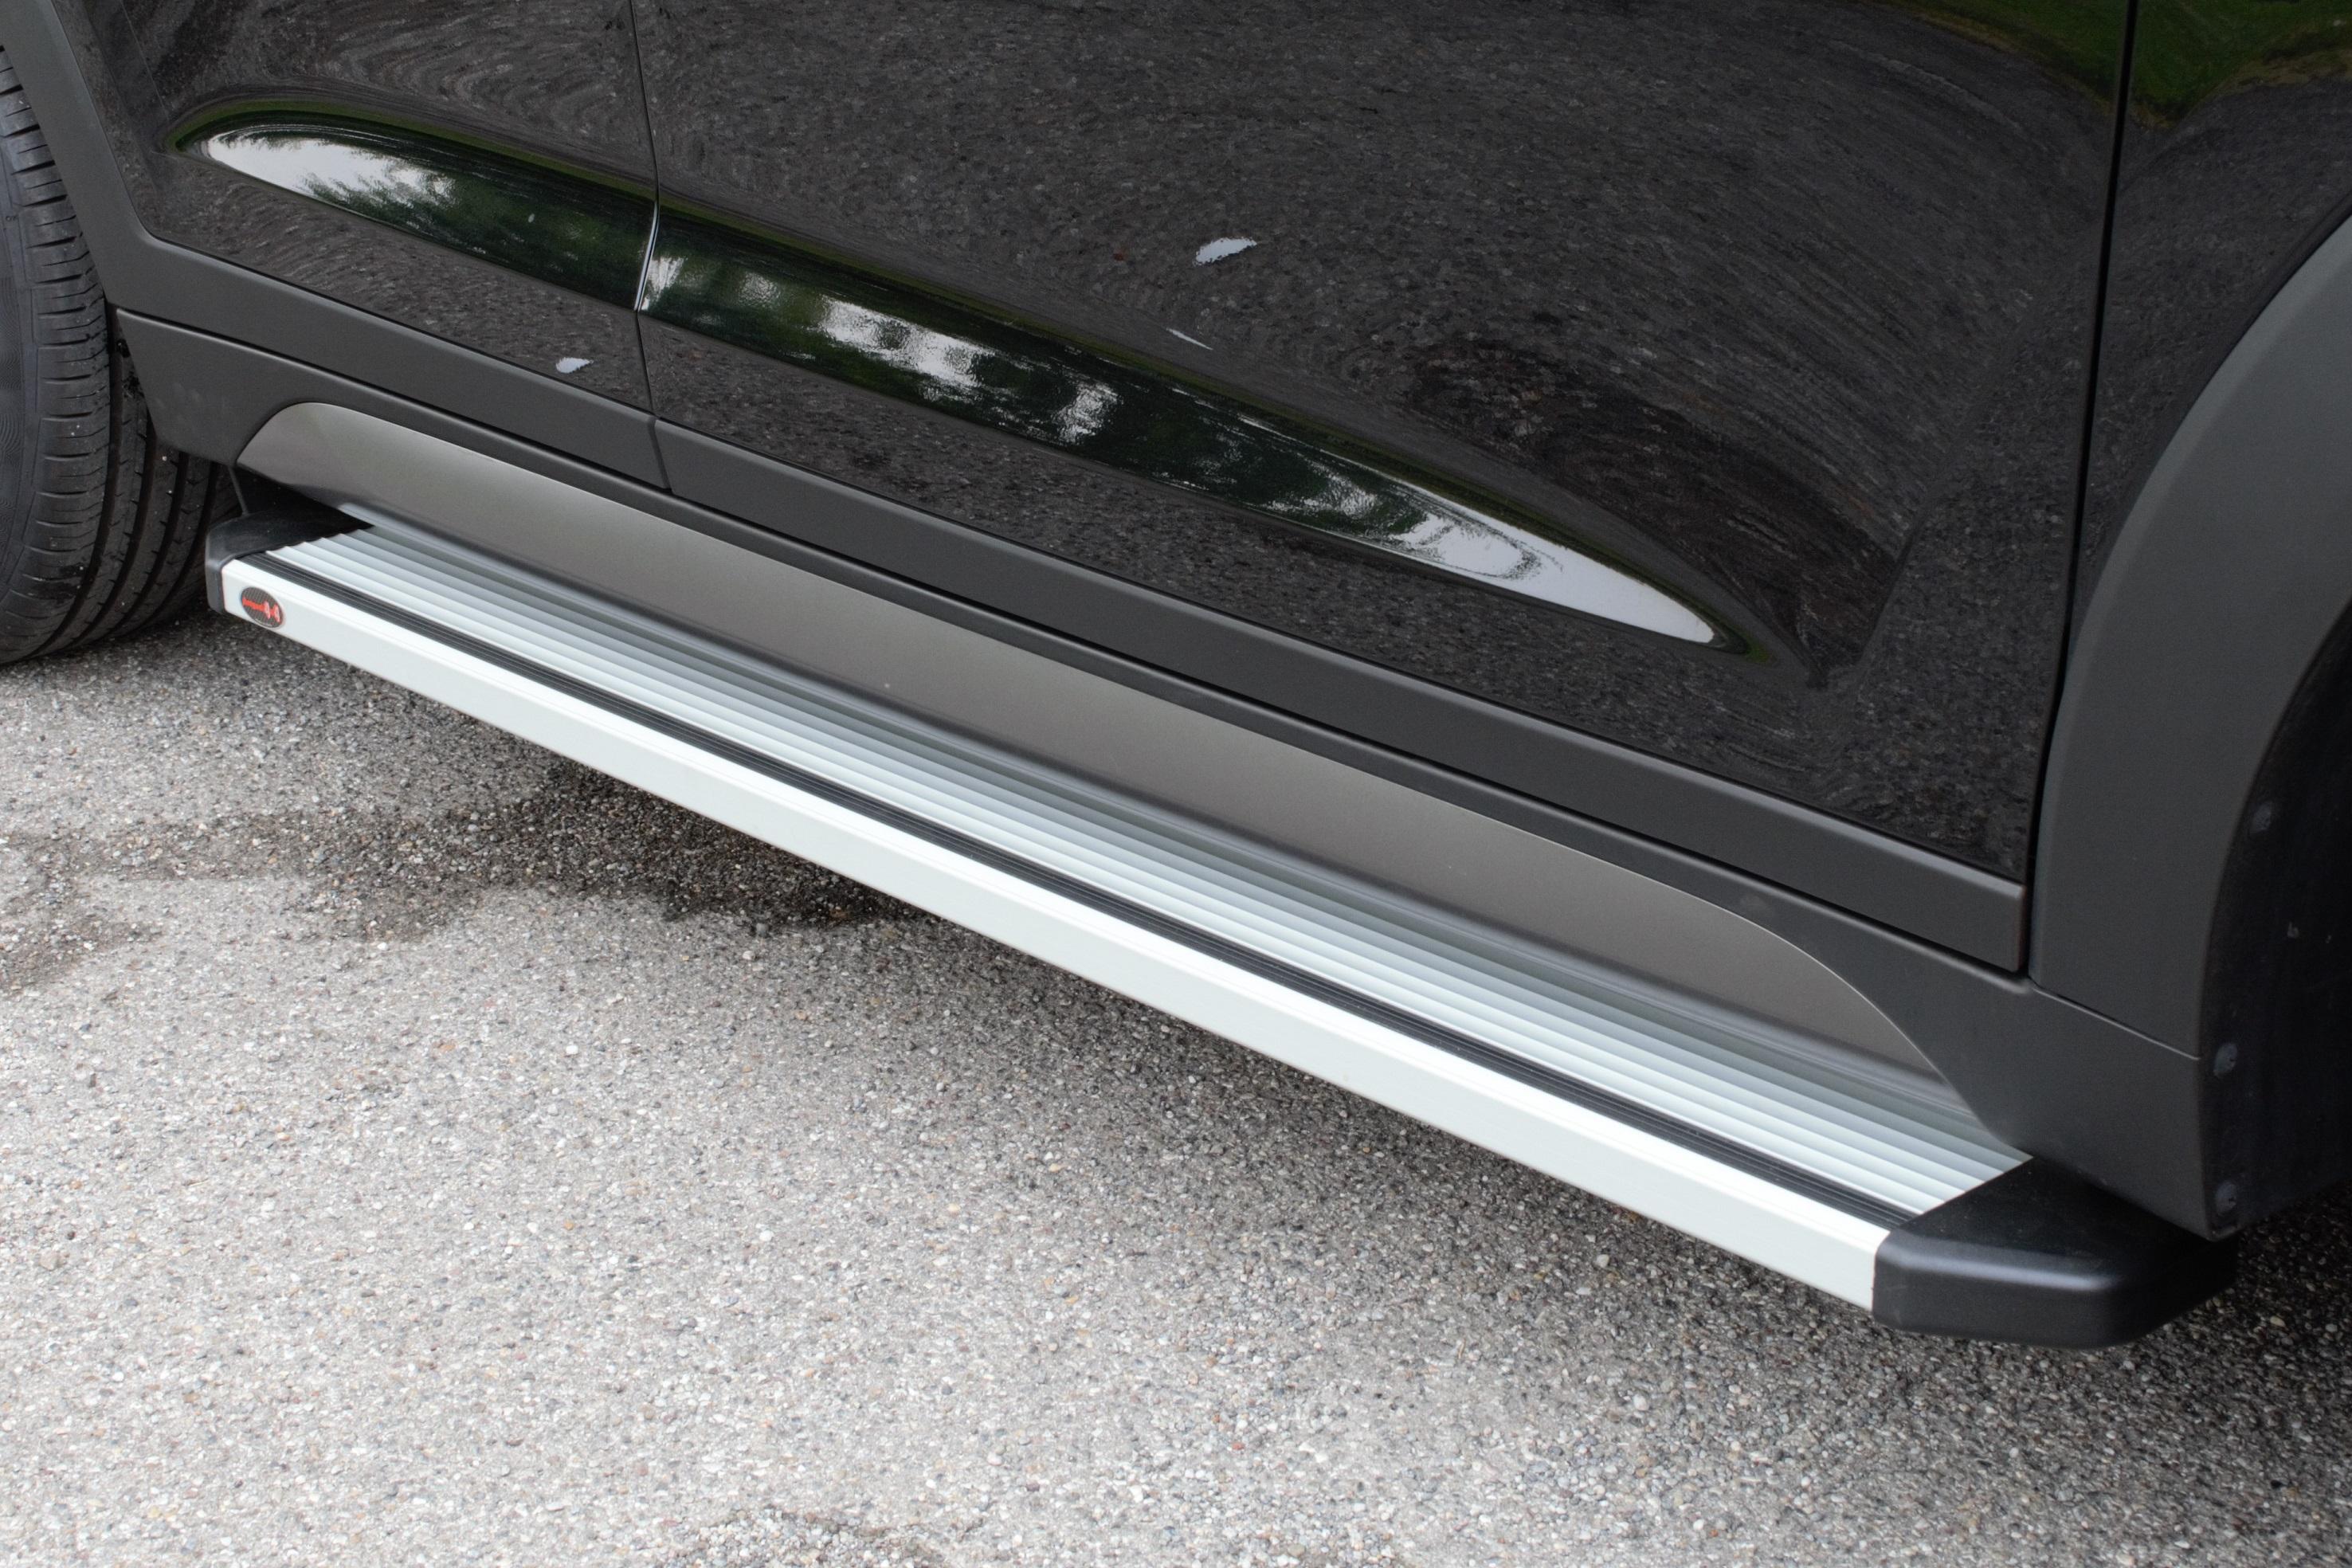 NOVISAuto Trittbretter Modell STD-FI für Fiat Fullback Extrakabine